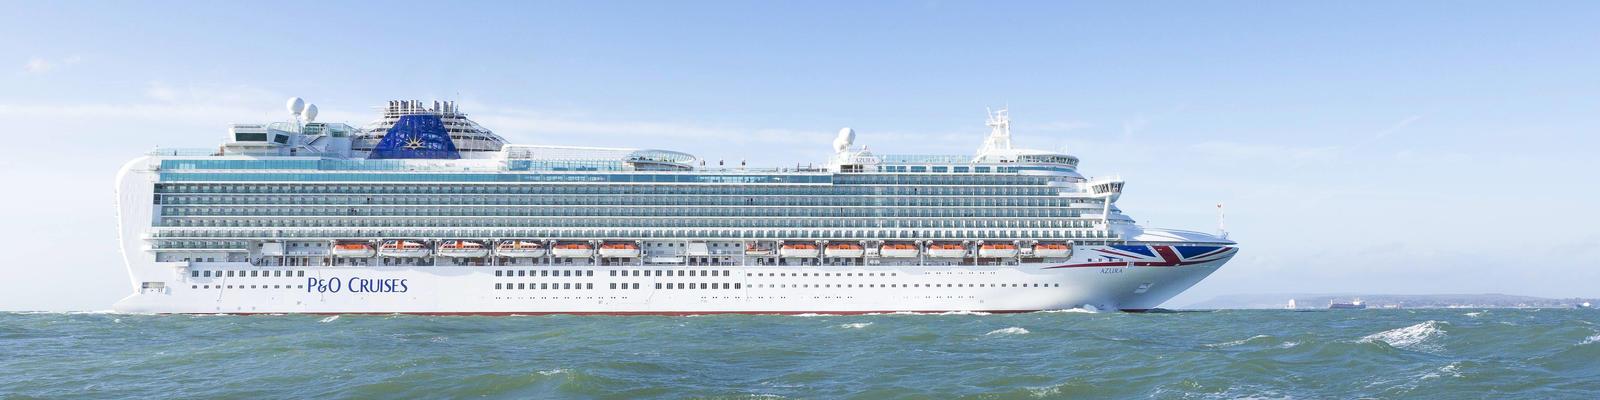 Azura (Photo: P&O Cruise Line)